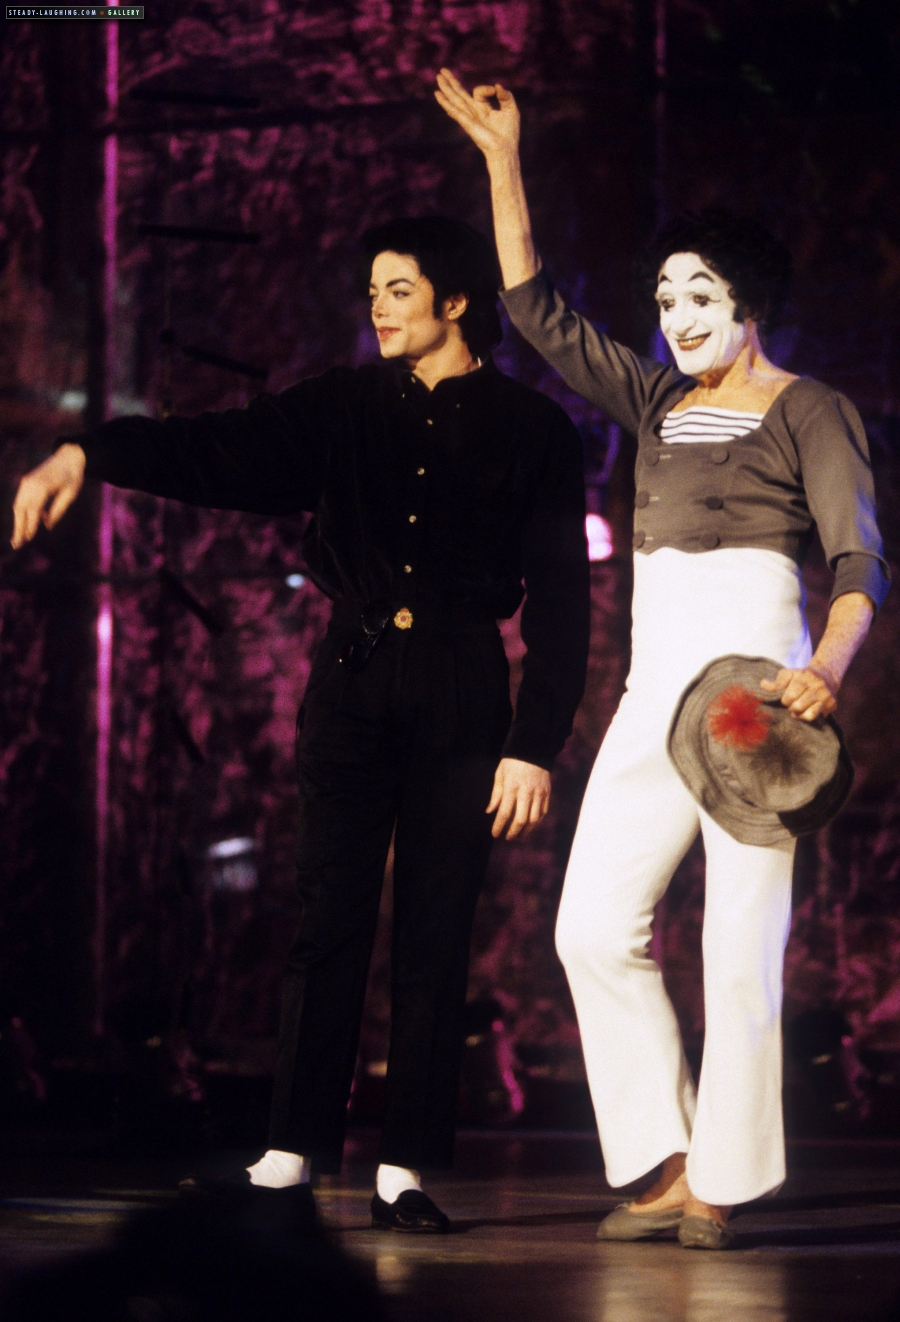 EVEN WHEN I'M ASLEEP I'M LOVING あなた BEAUTIFUL MICHAEL